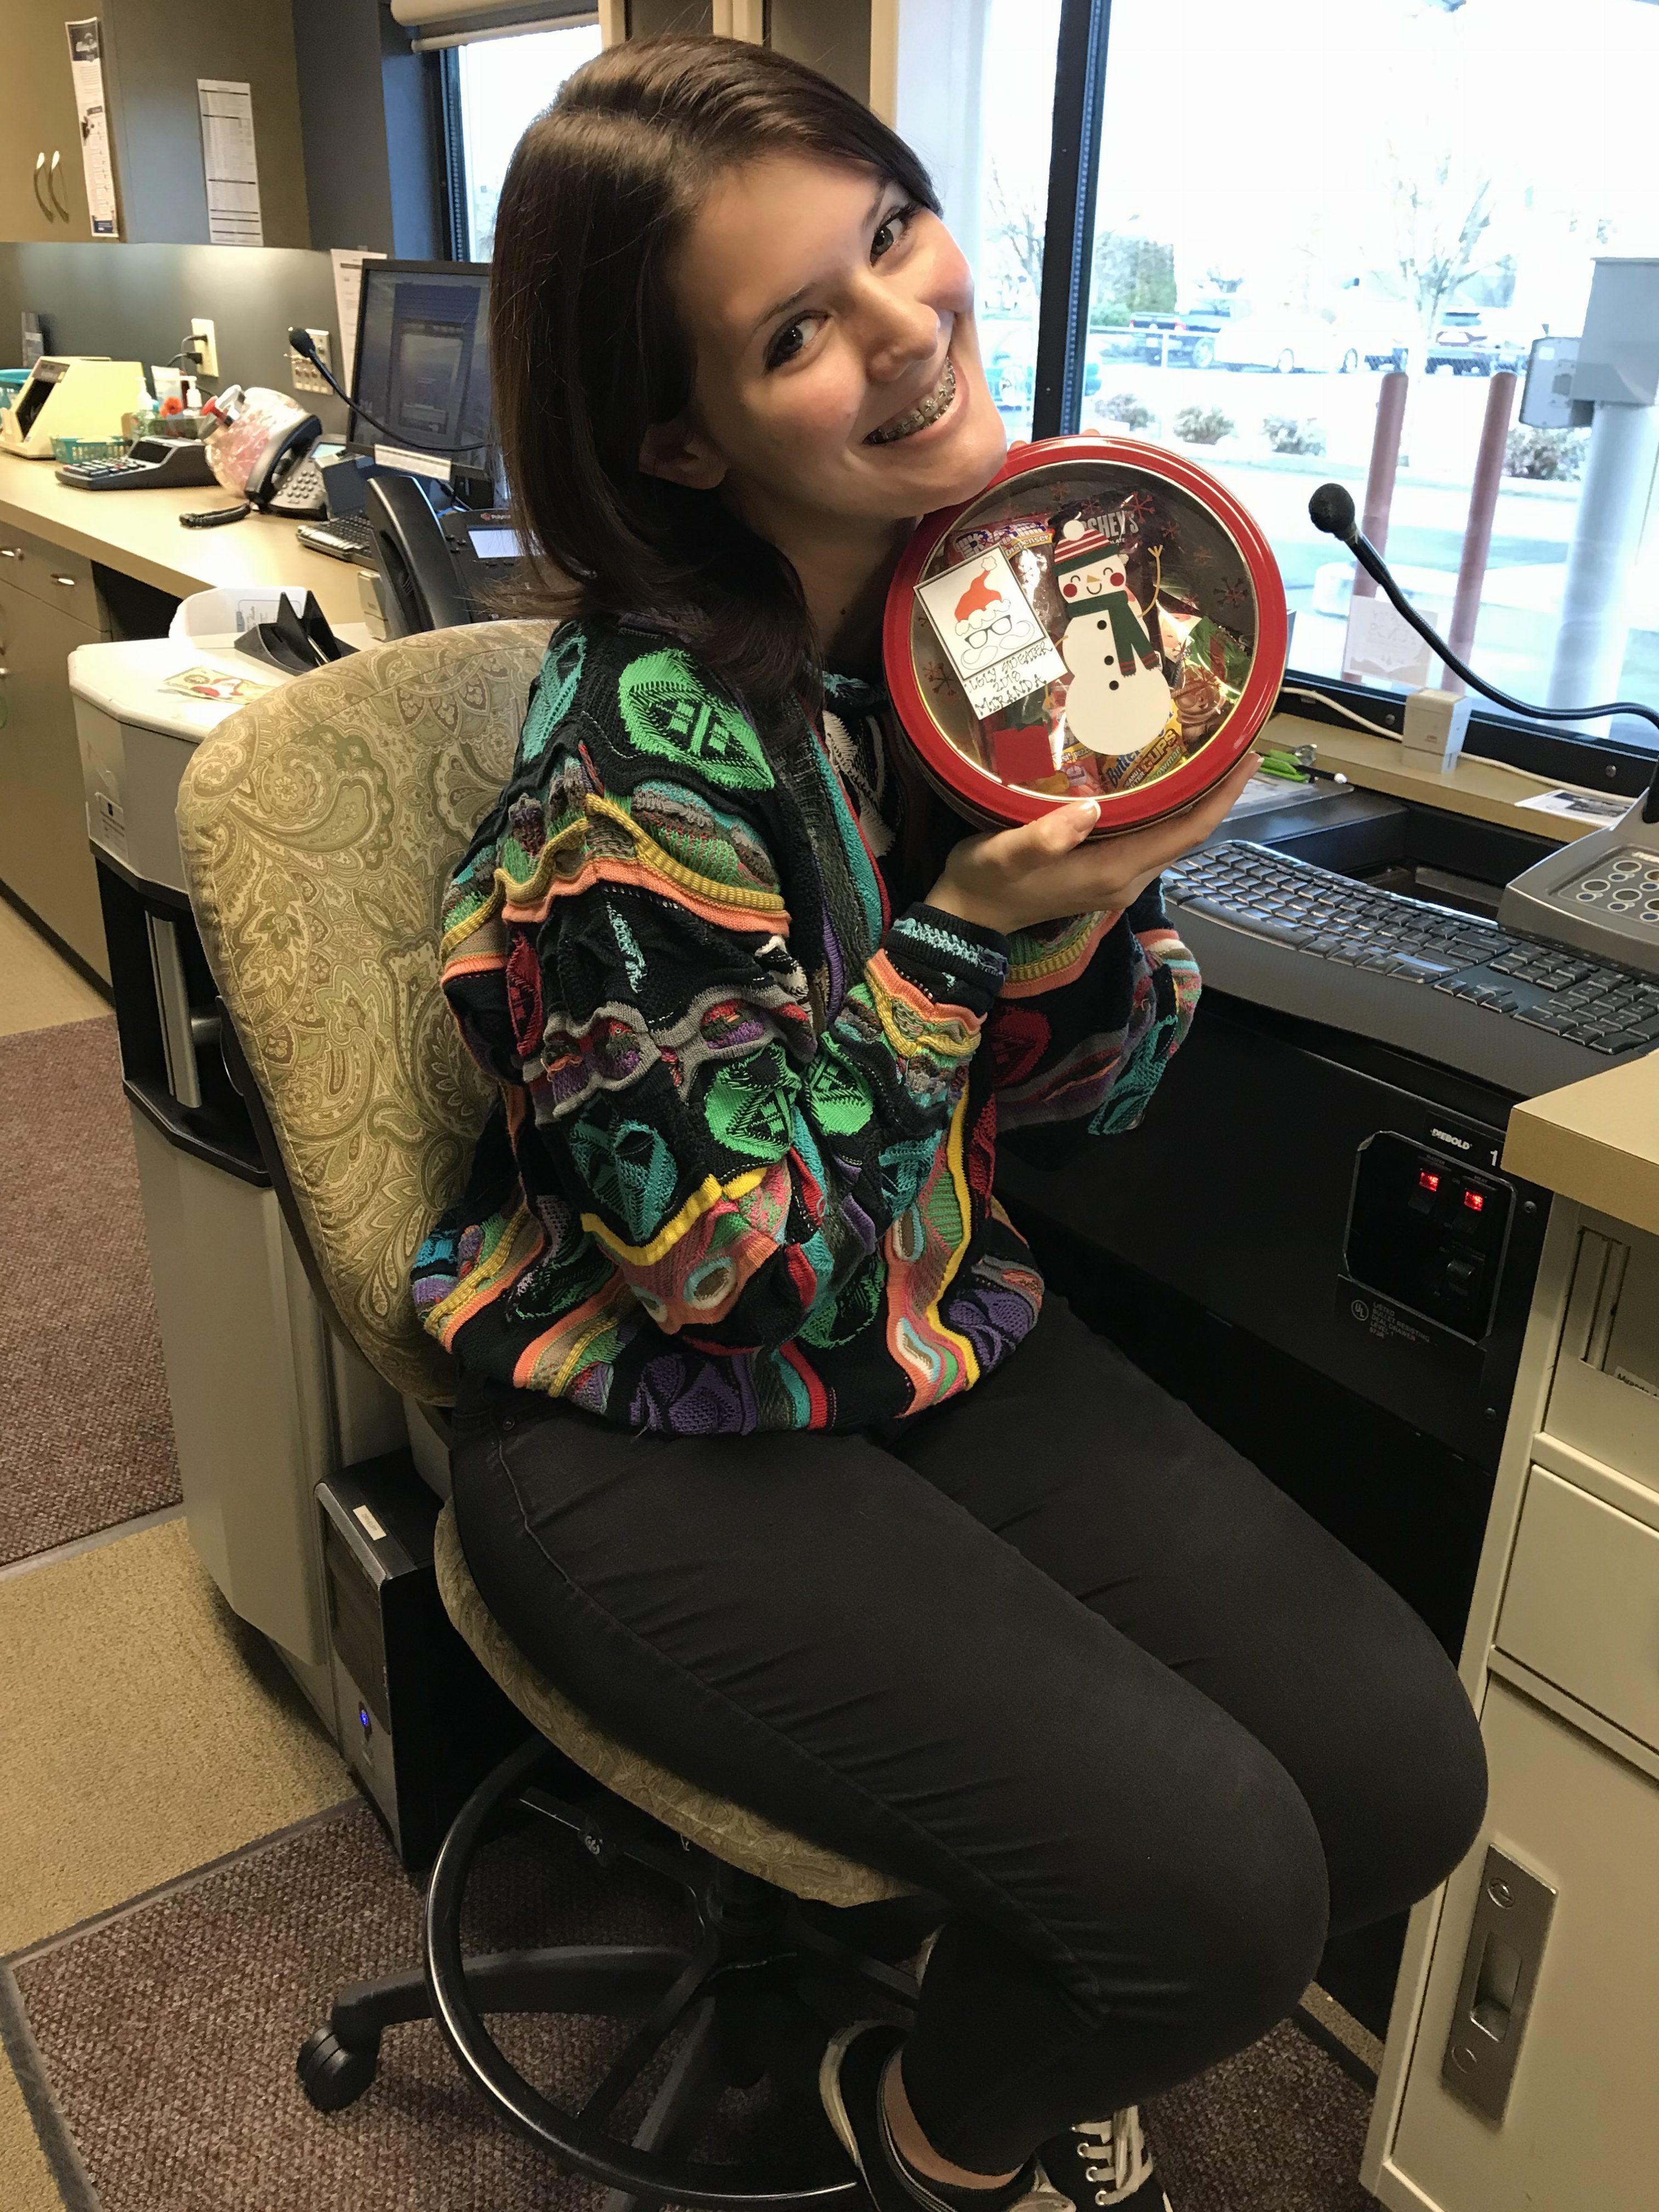 WRCU employee with bowl of treats